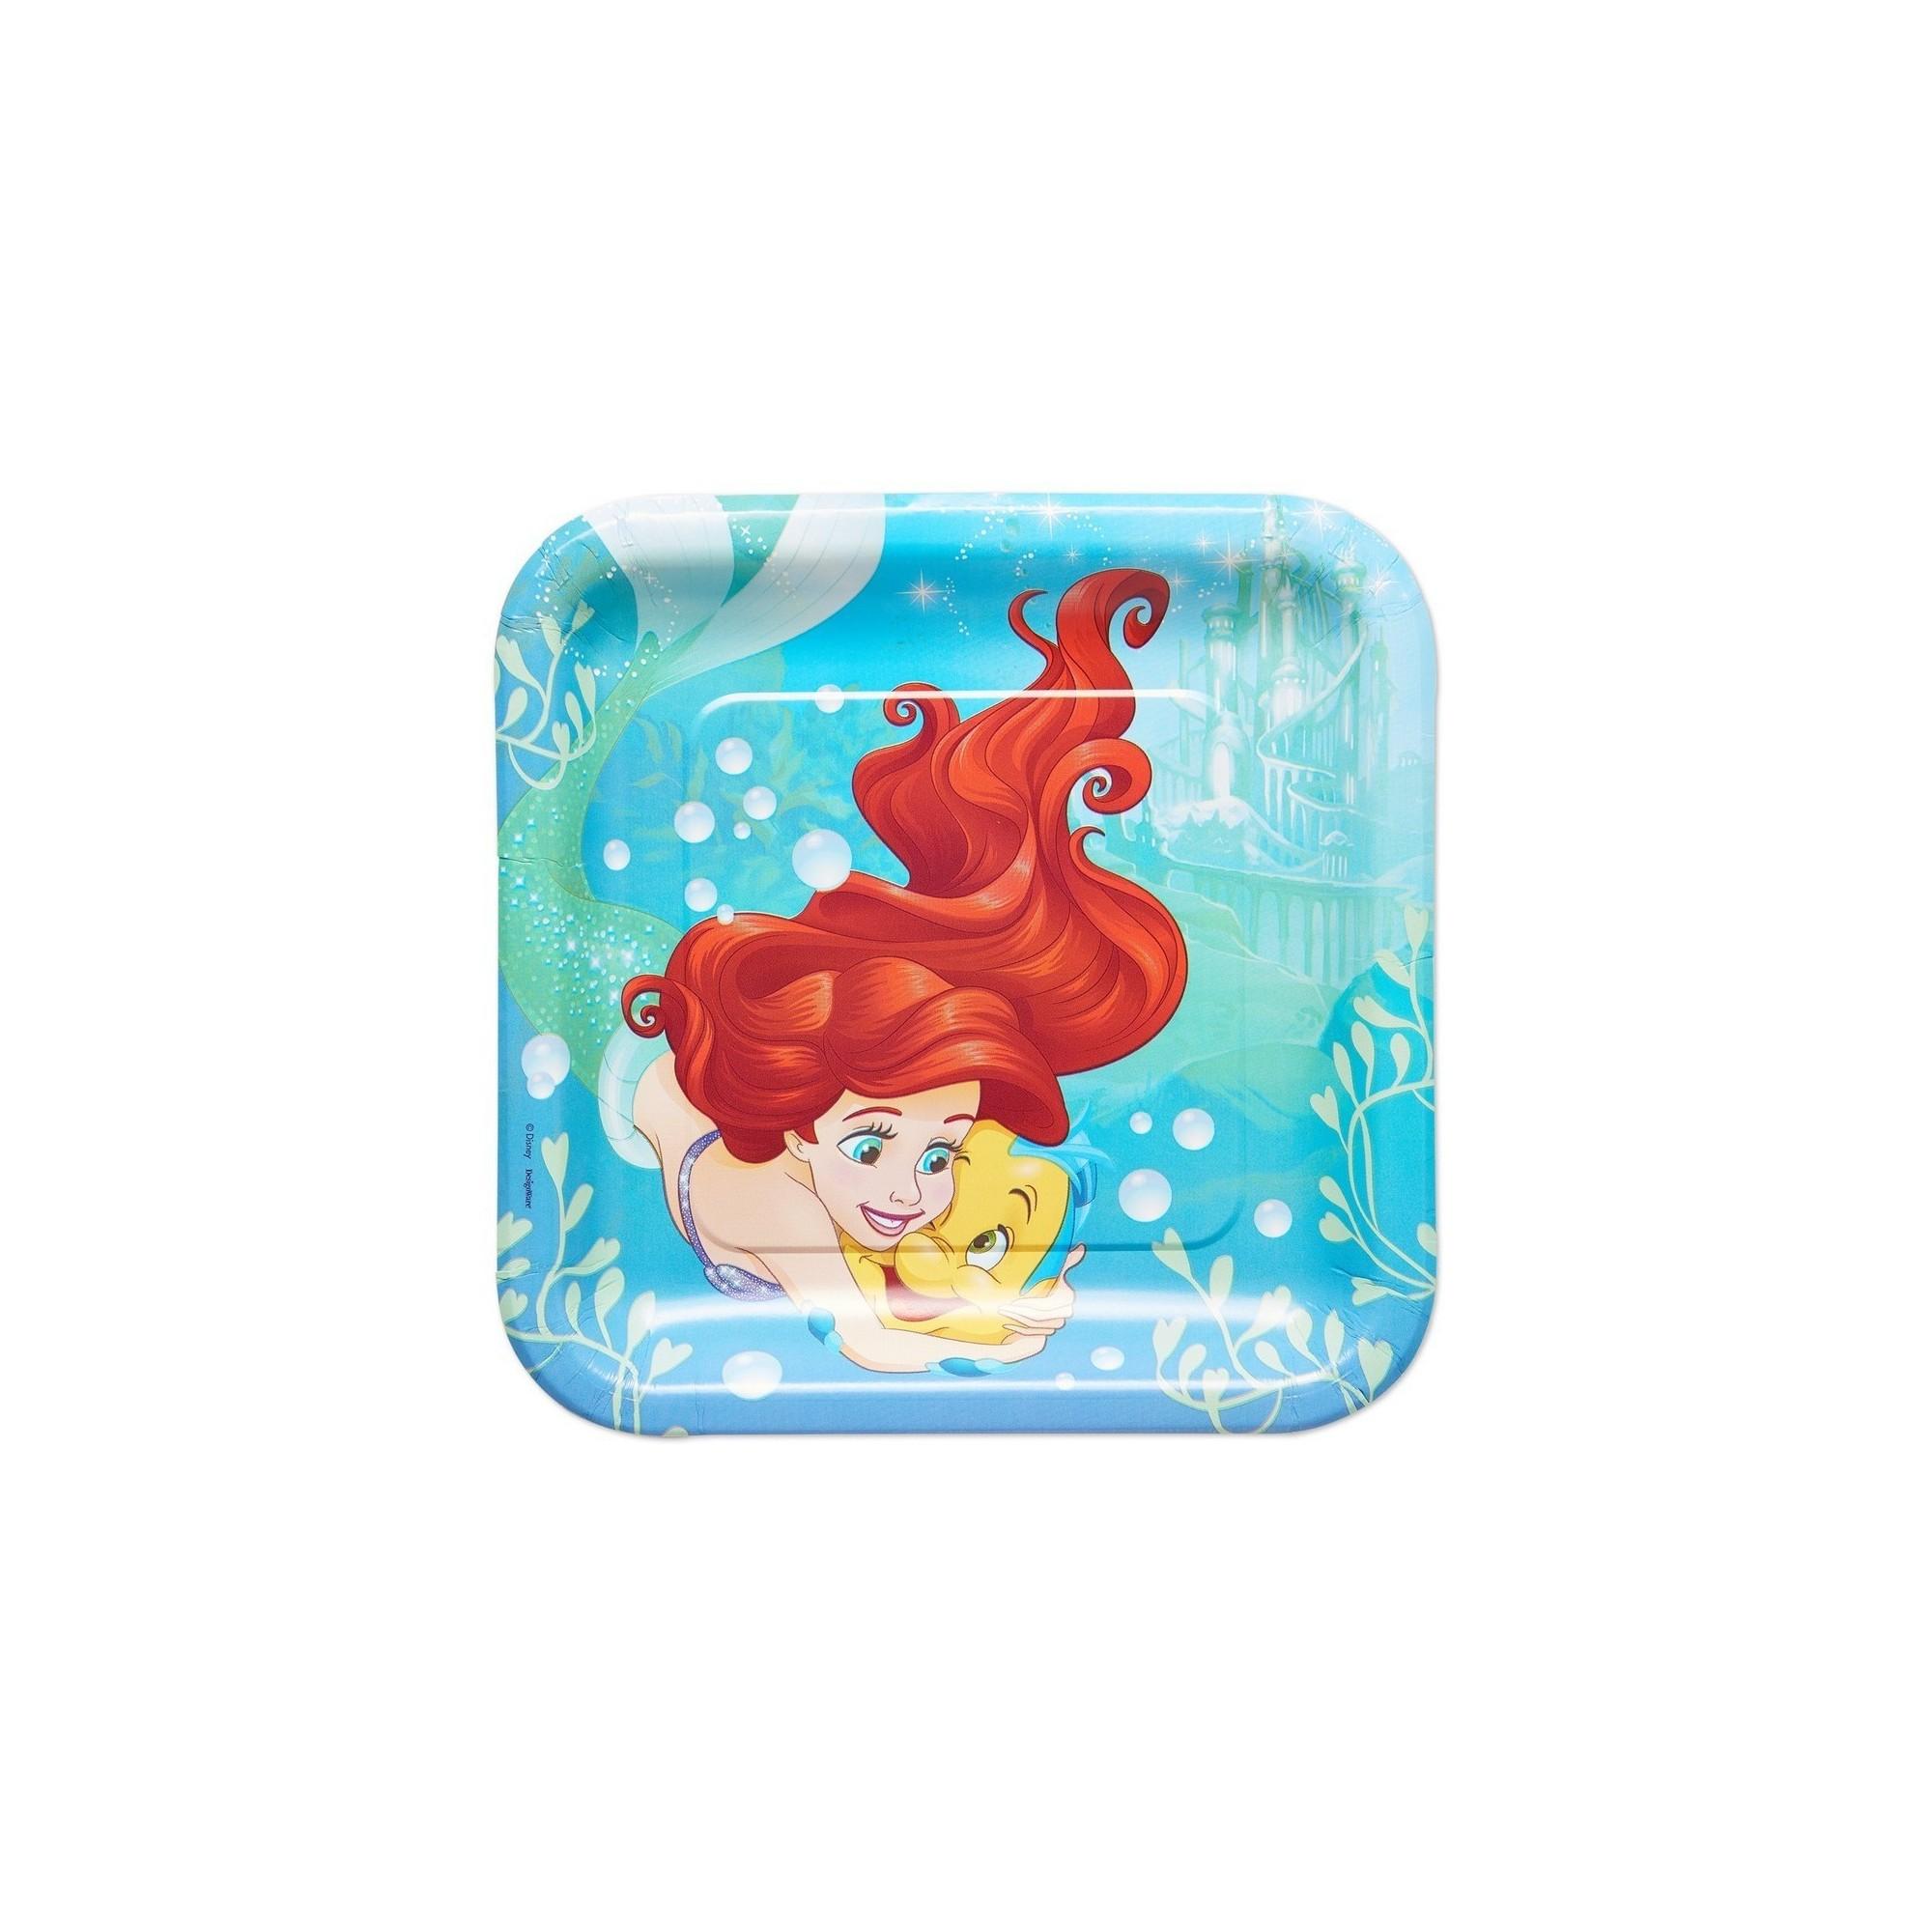 8ct The Little Mermaid Ariel Square Disposable Plates, Multi-Colored